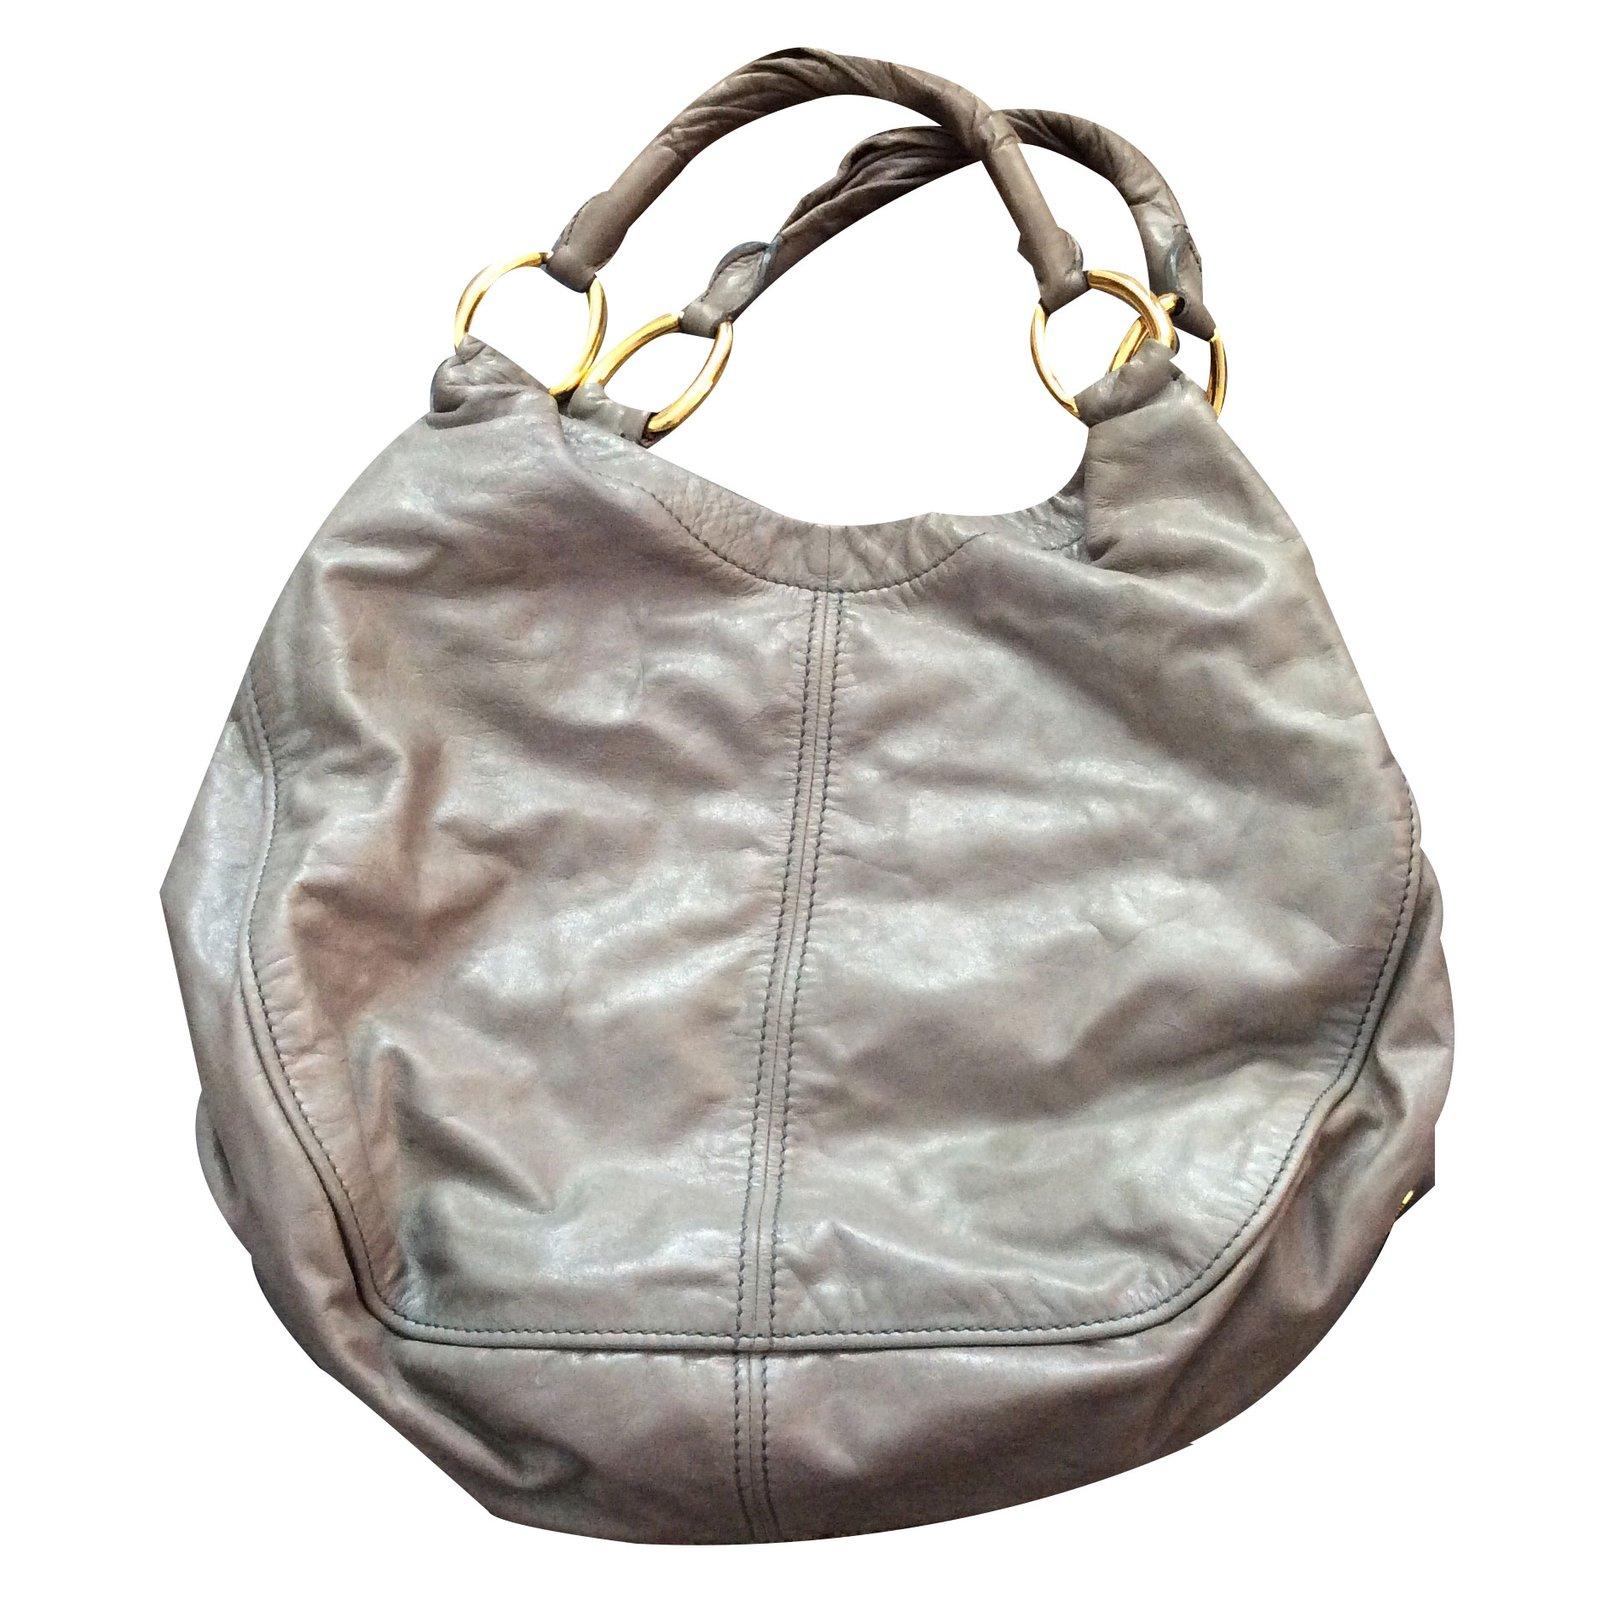 0ffd519cdc28 Miu Large Hobo Handbags Leather Grey Ref 19765 Joli Closet. Handbags 5be896  Fvj F0002 V Ooo Loading